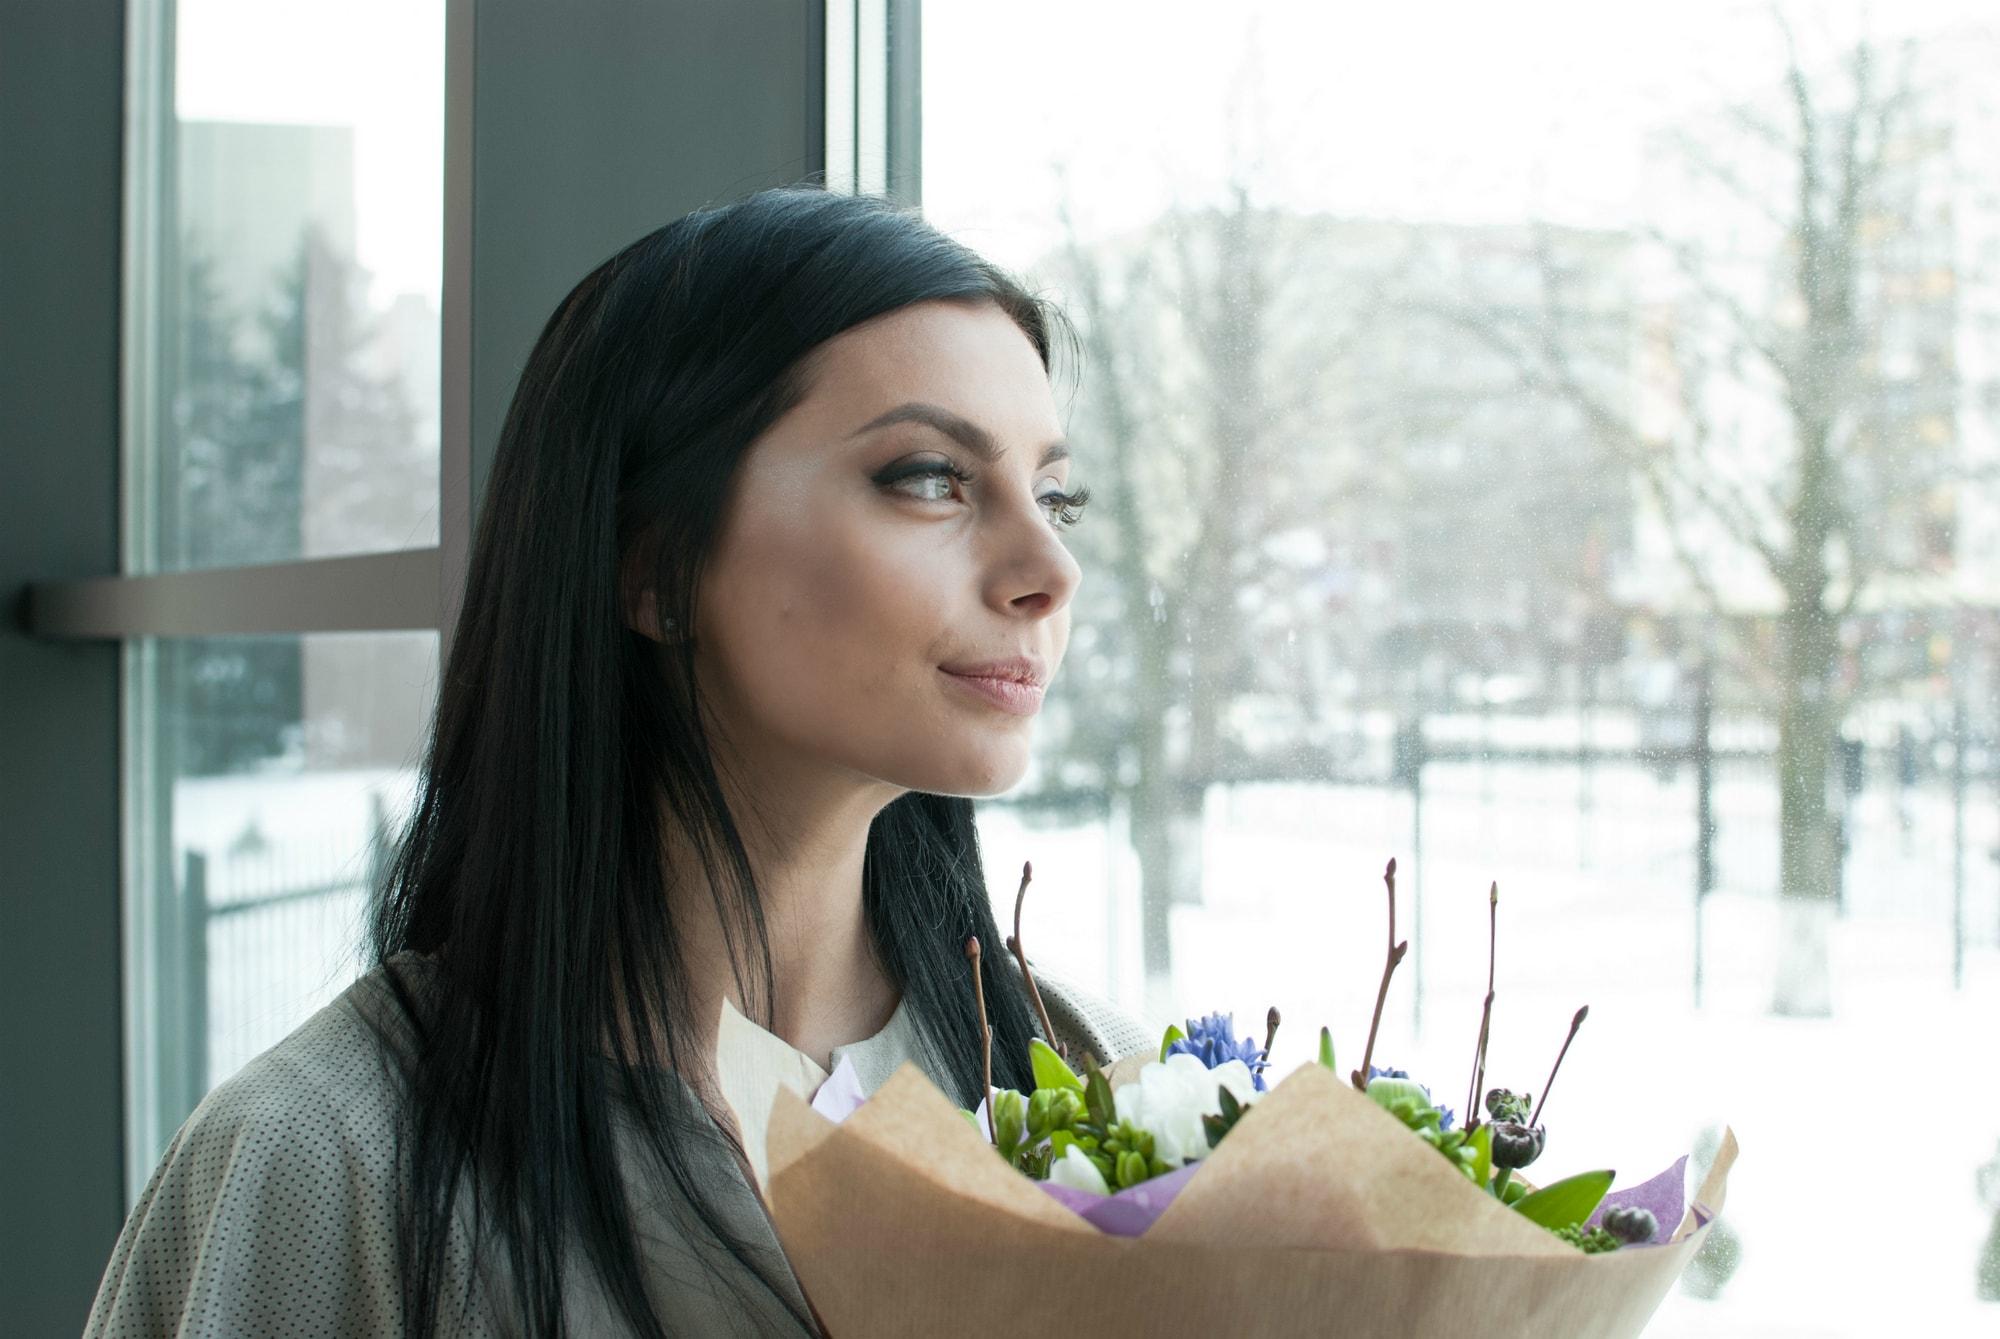 Невеста возле окна - Фотограф Киев - Женя Лайт